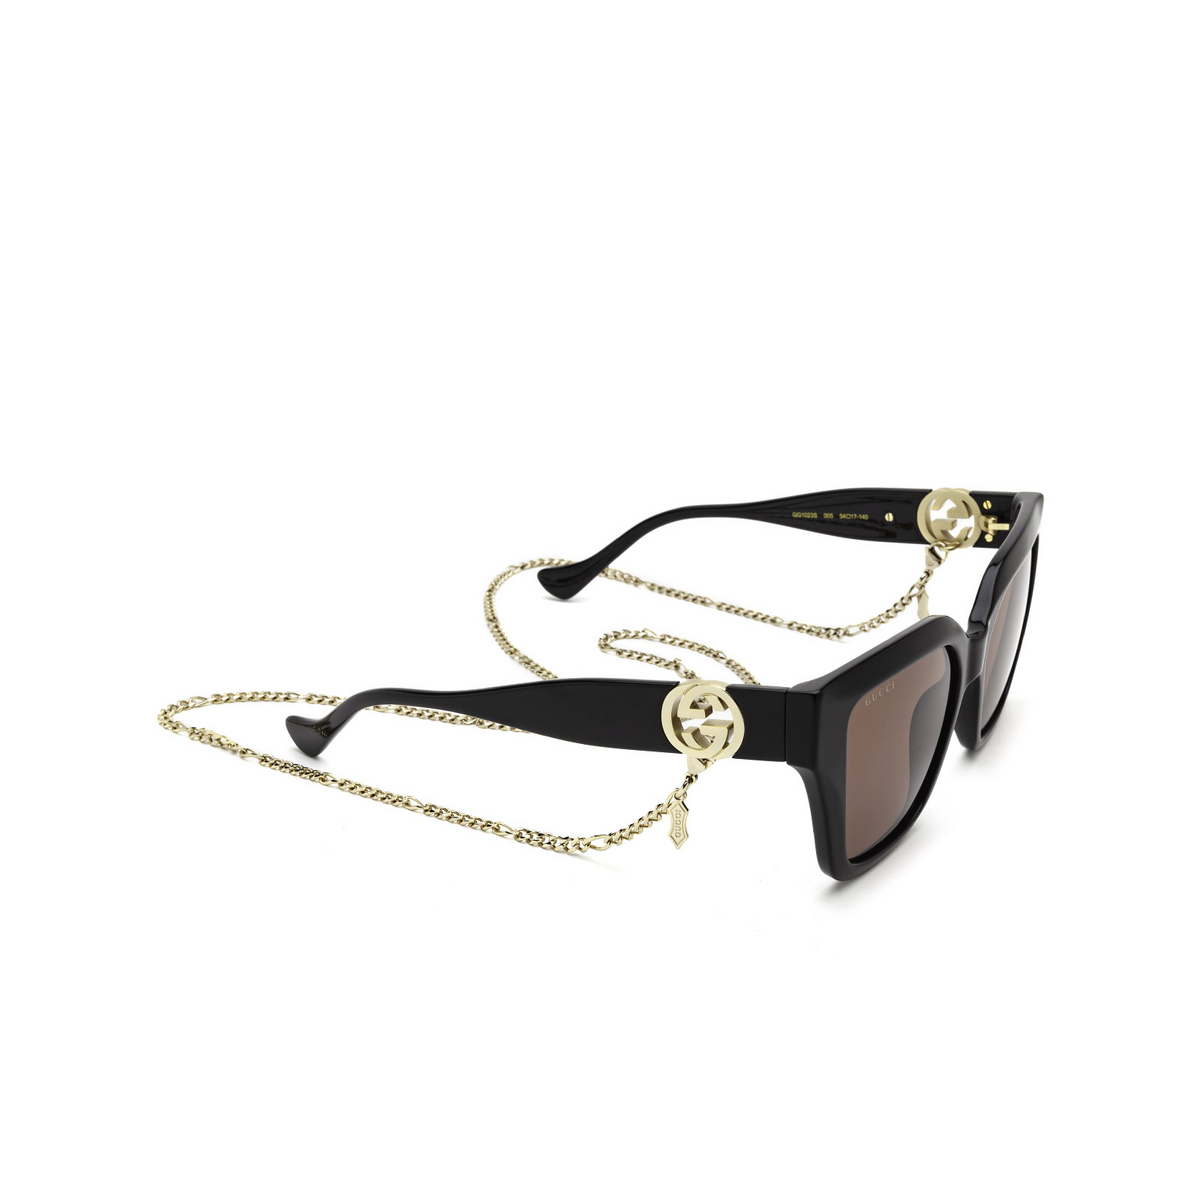 Gucci® Cat-eye Sunglasses: GG1023S color Black 005 - three-quarters view.